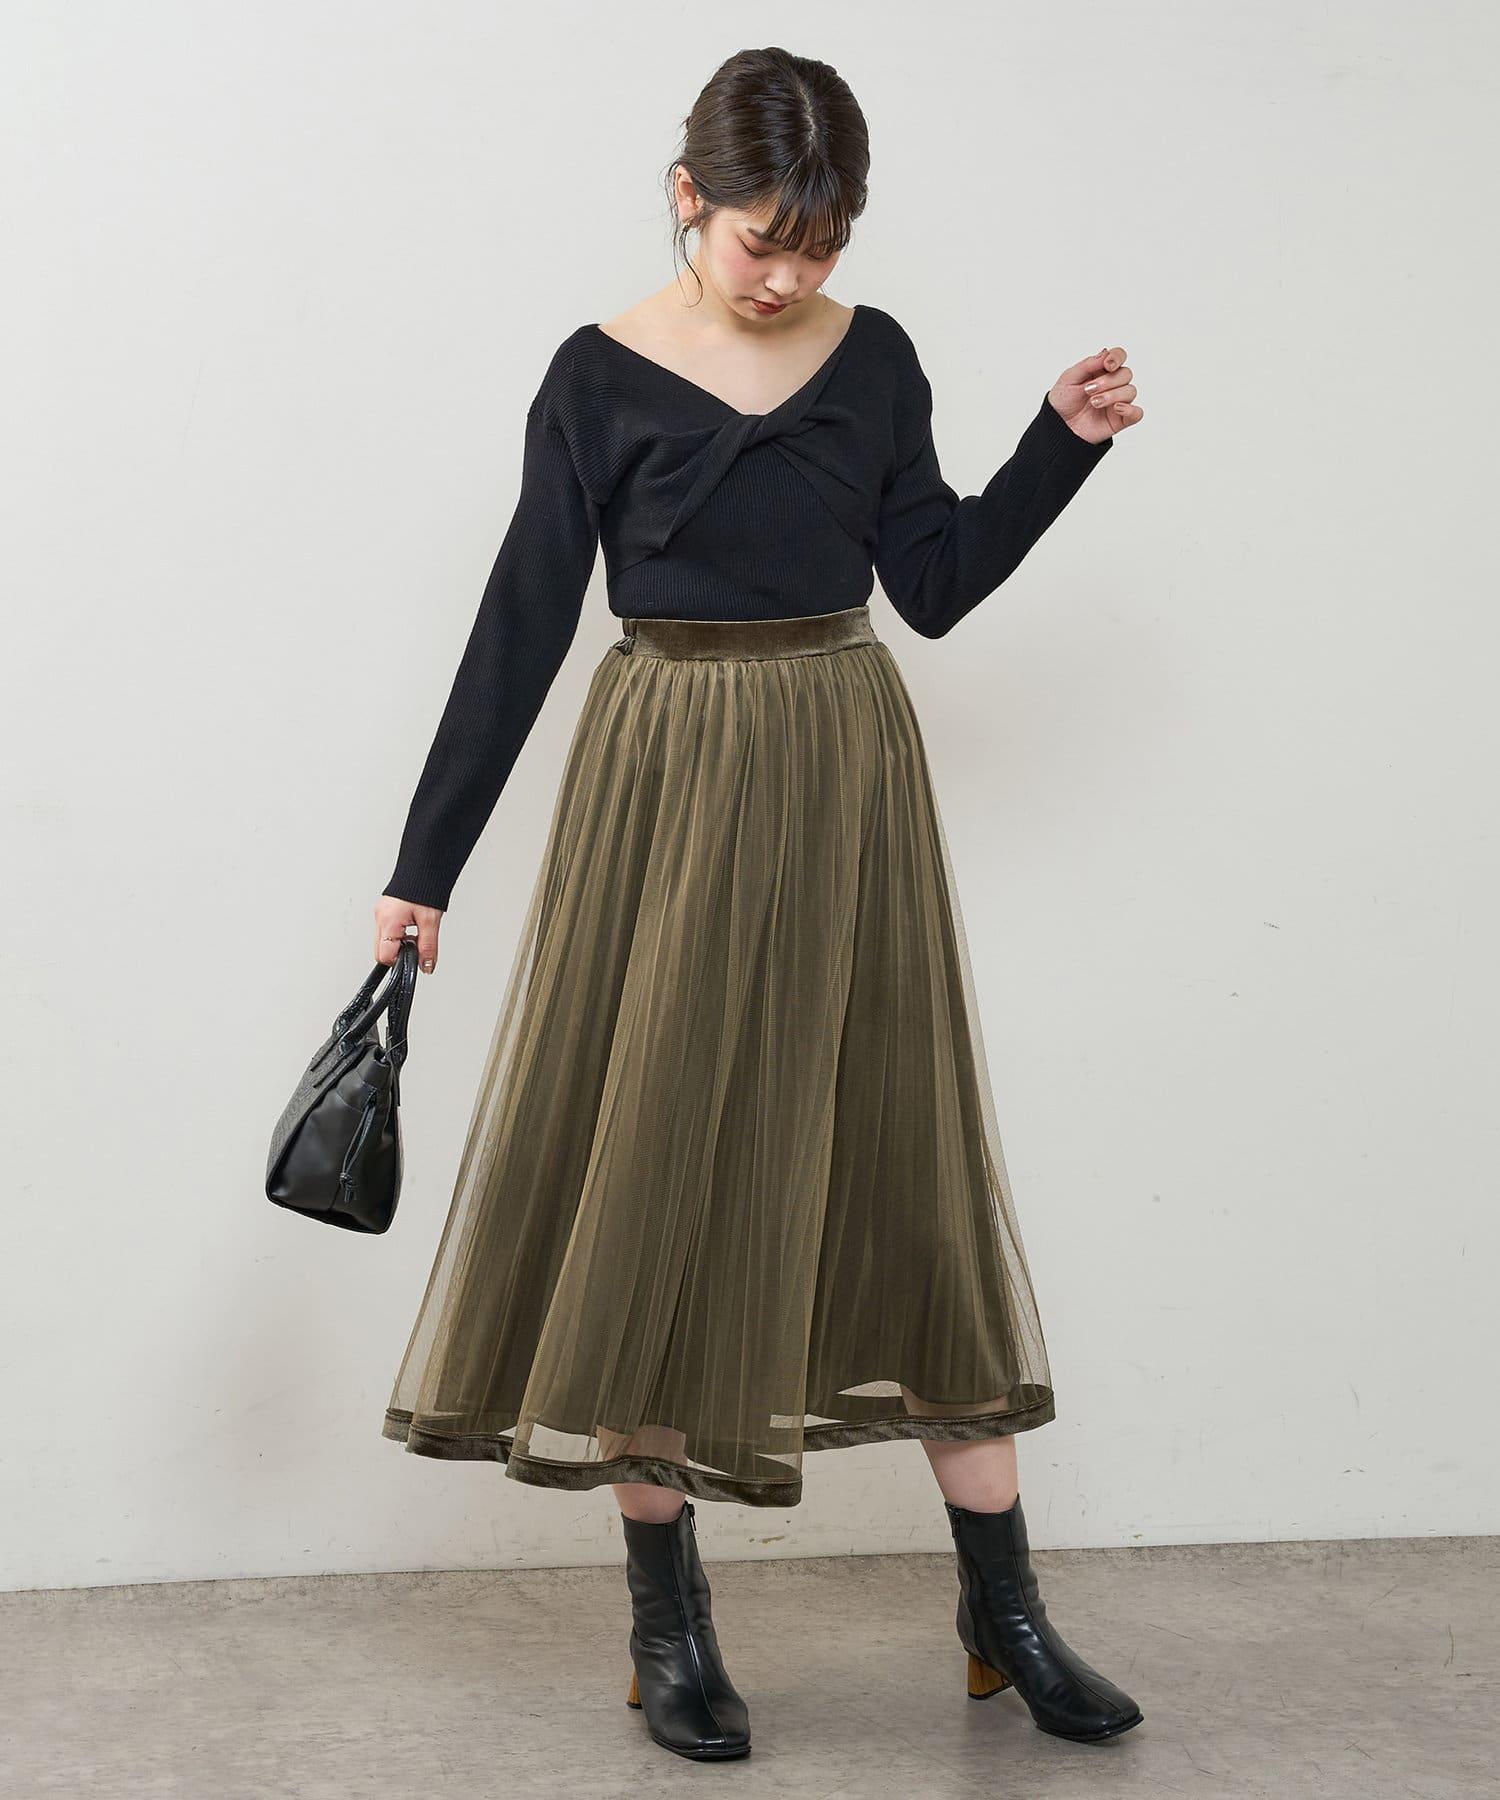 natural couture(ナチュラルクチュール) 【大好評リバイバルアイテム】裾べロアパイピングチュールプリーツスカート